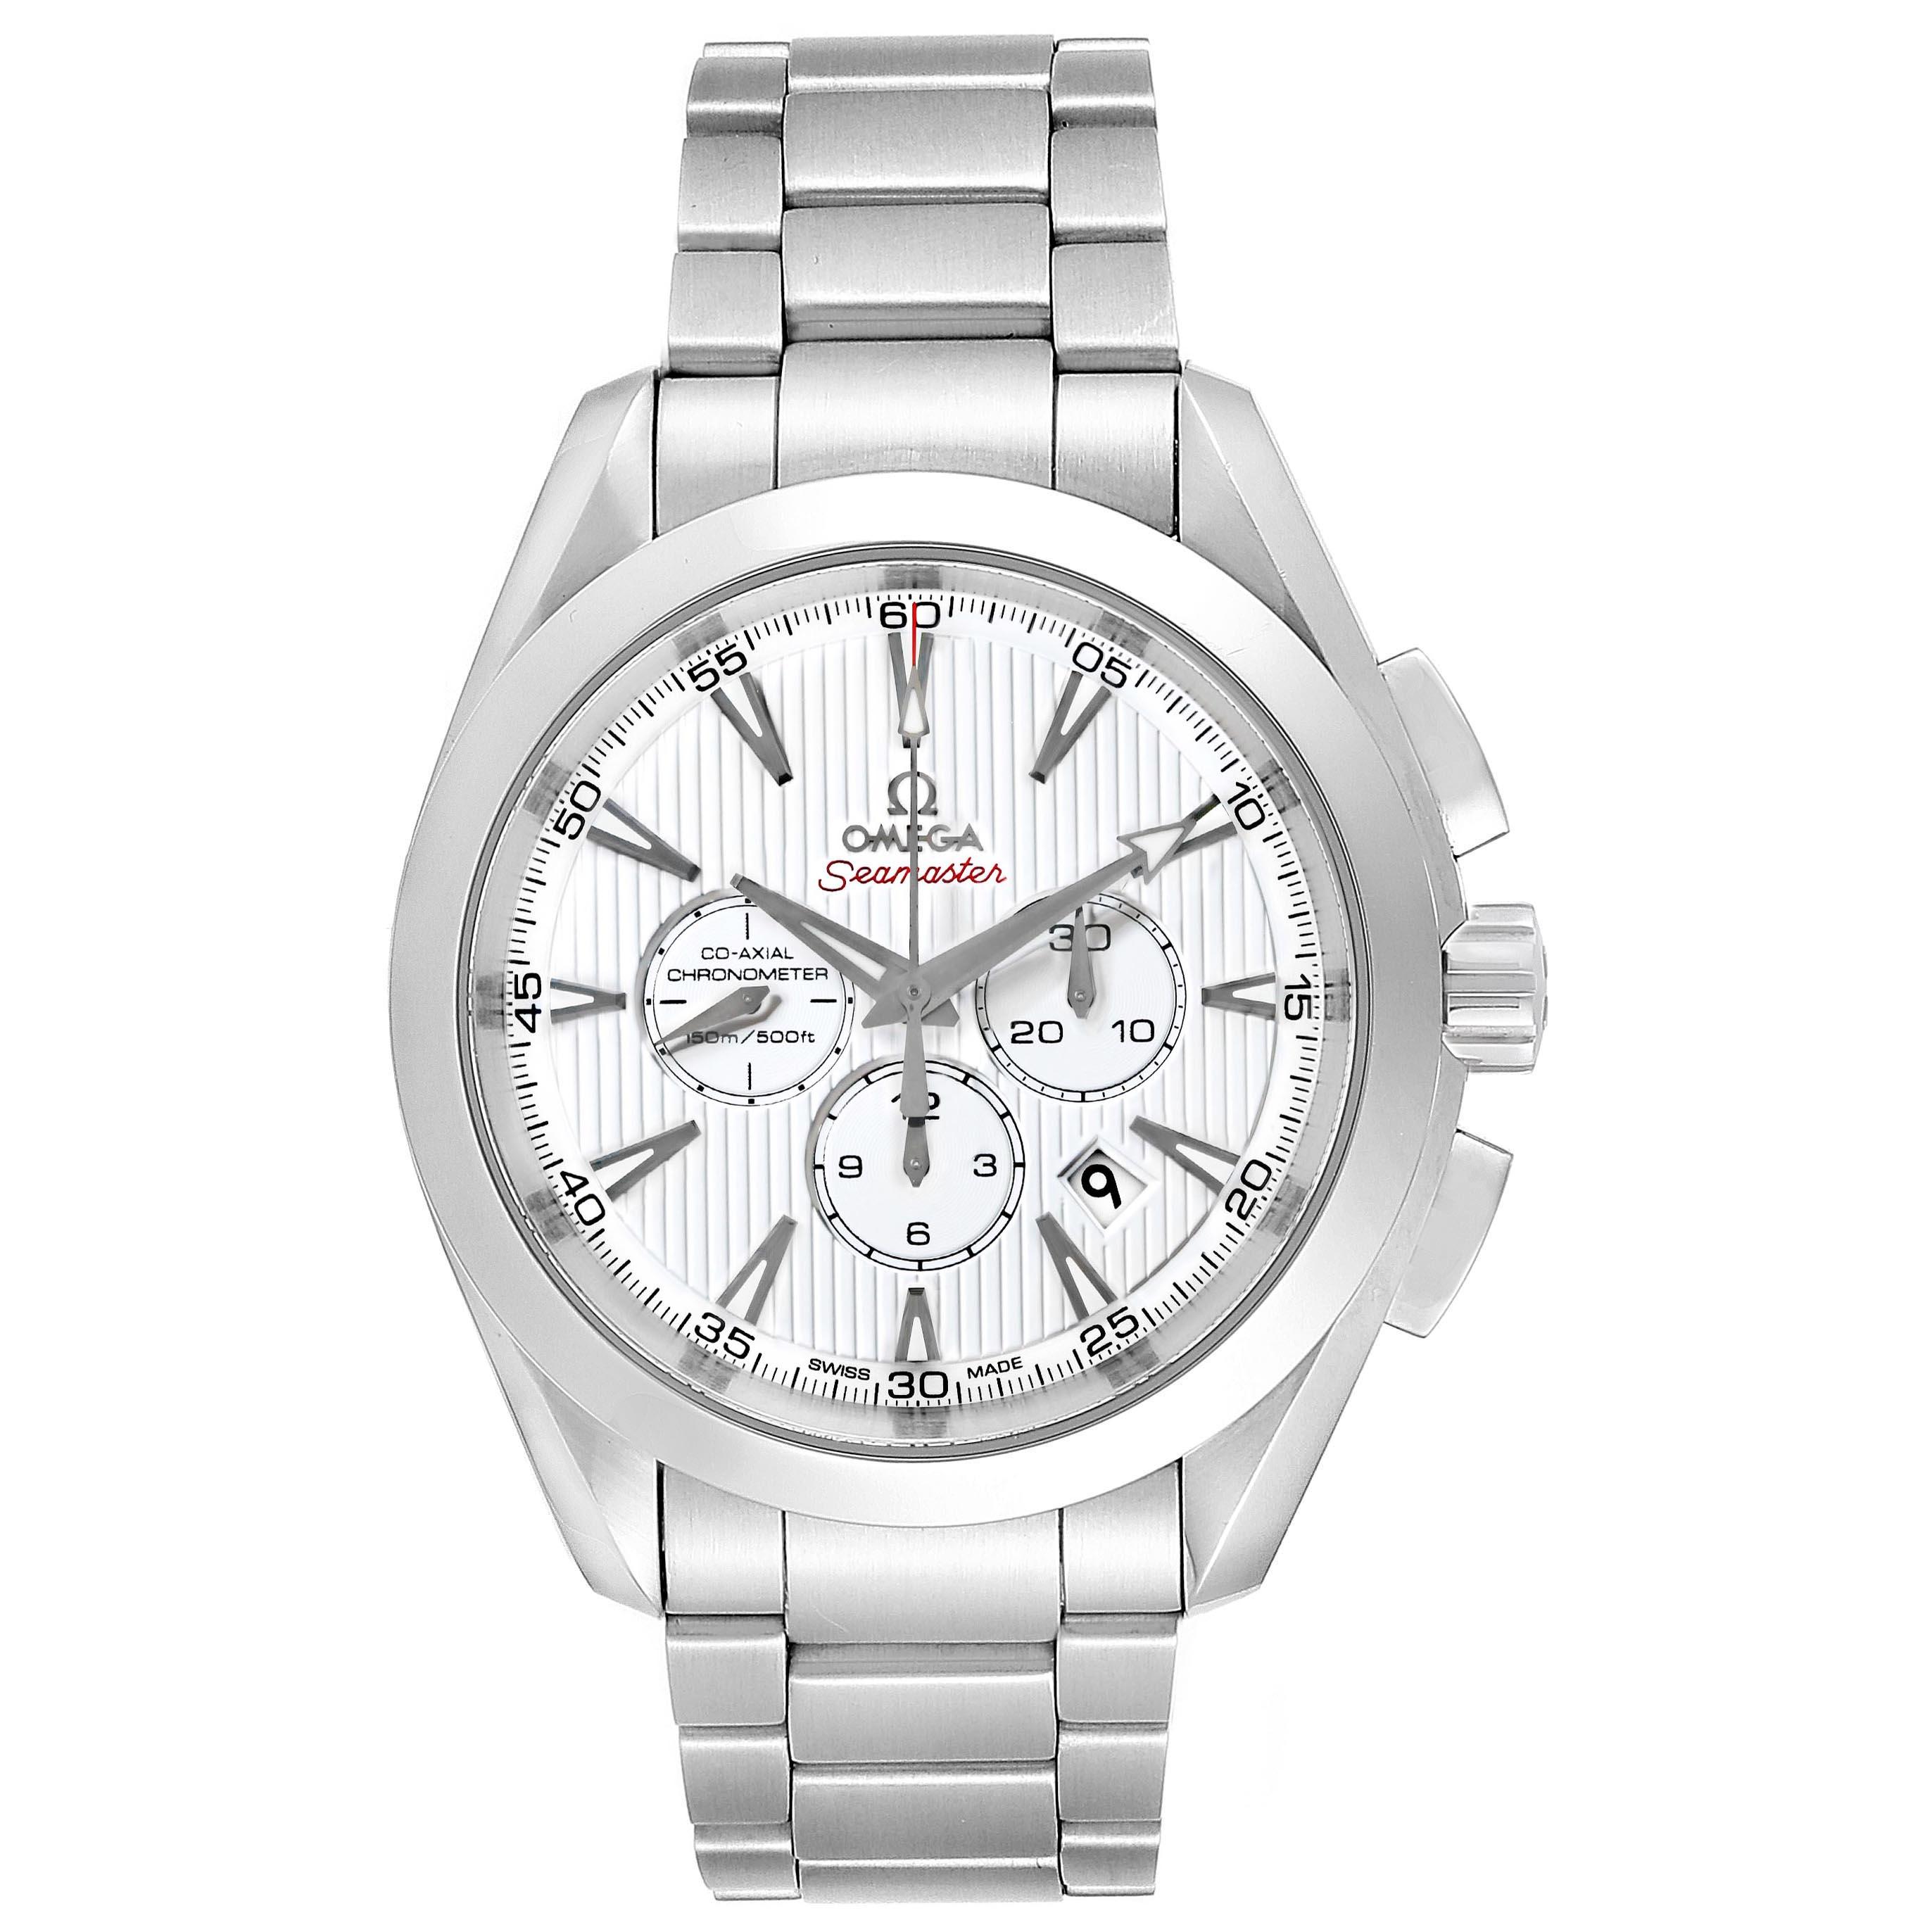 Omega Seamaster Aqua Terra Chrono Watch 231.10.44.50.04.001 SwissWatchExpo